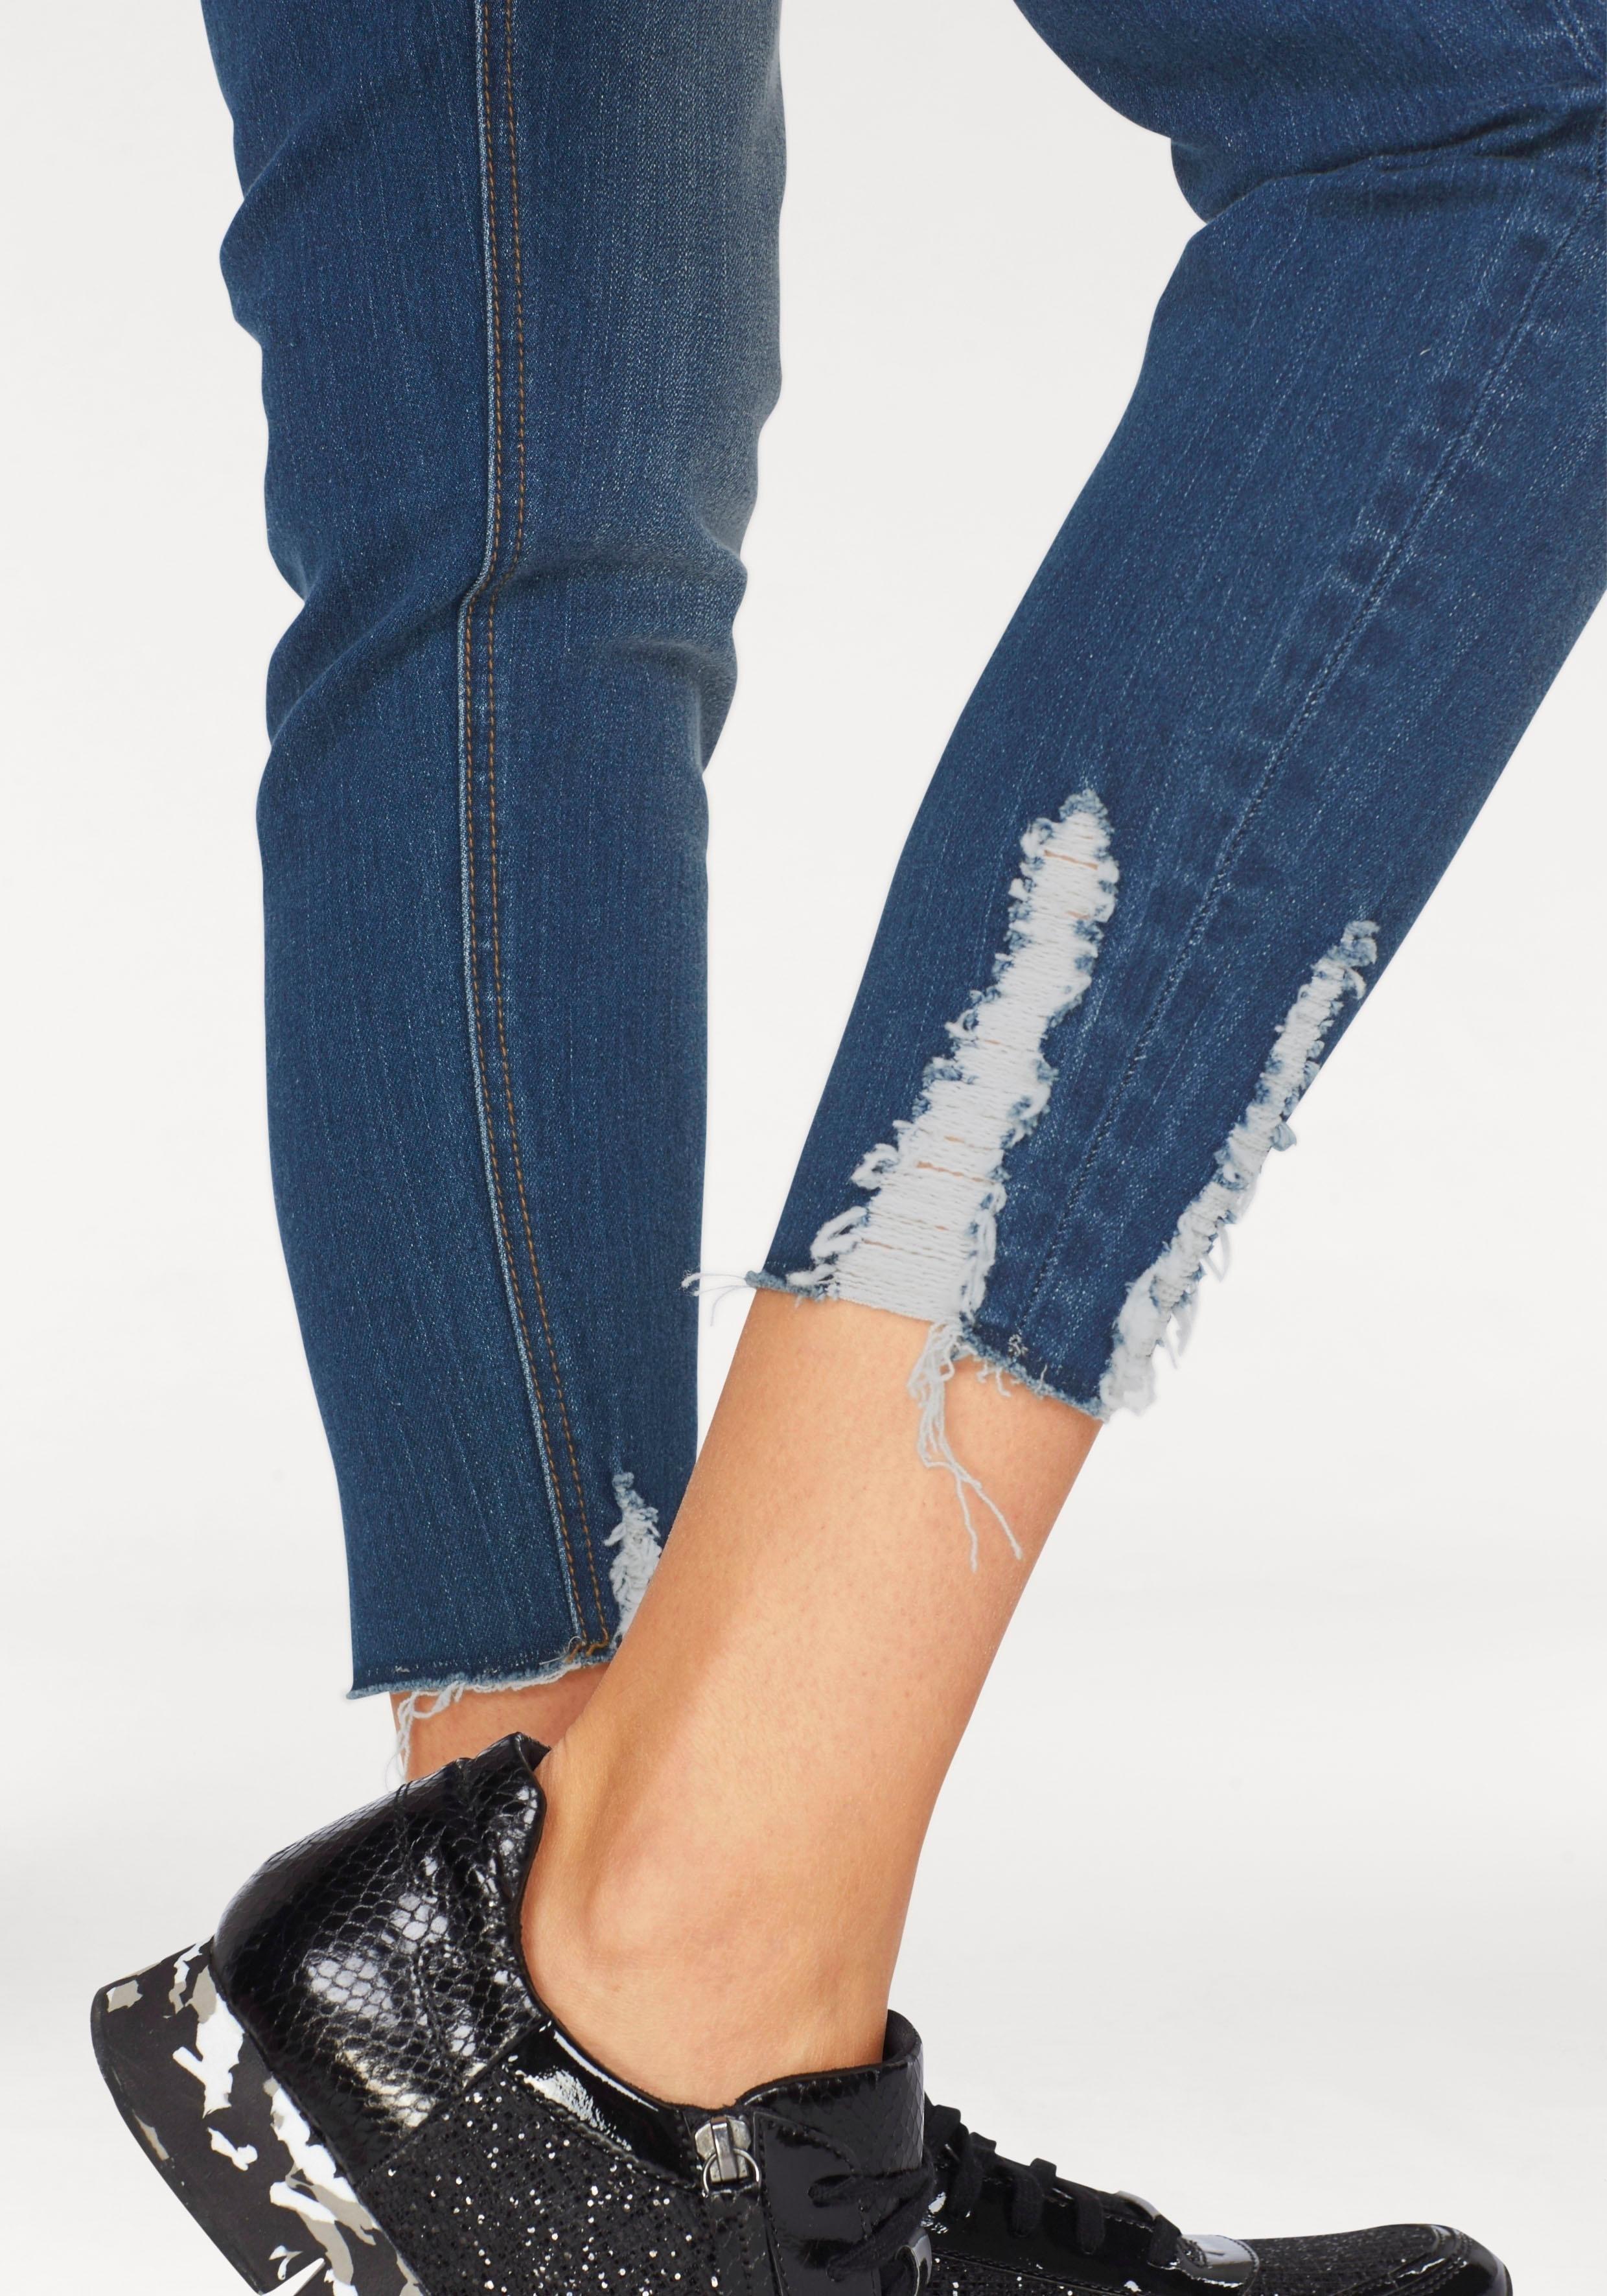 Bestellen Bestellen Bij Skinny Skinny Aniston jeans jeans Aniston Bestellen Aniston Skinny Bij jeans rxeCBWdo